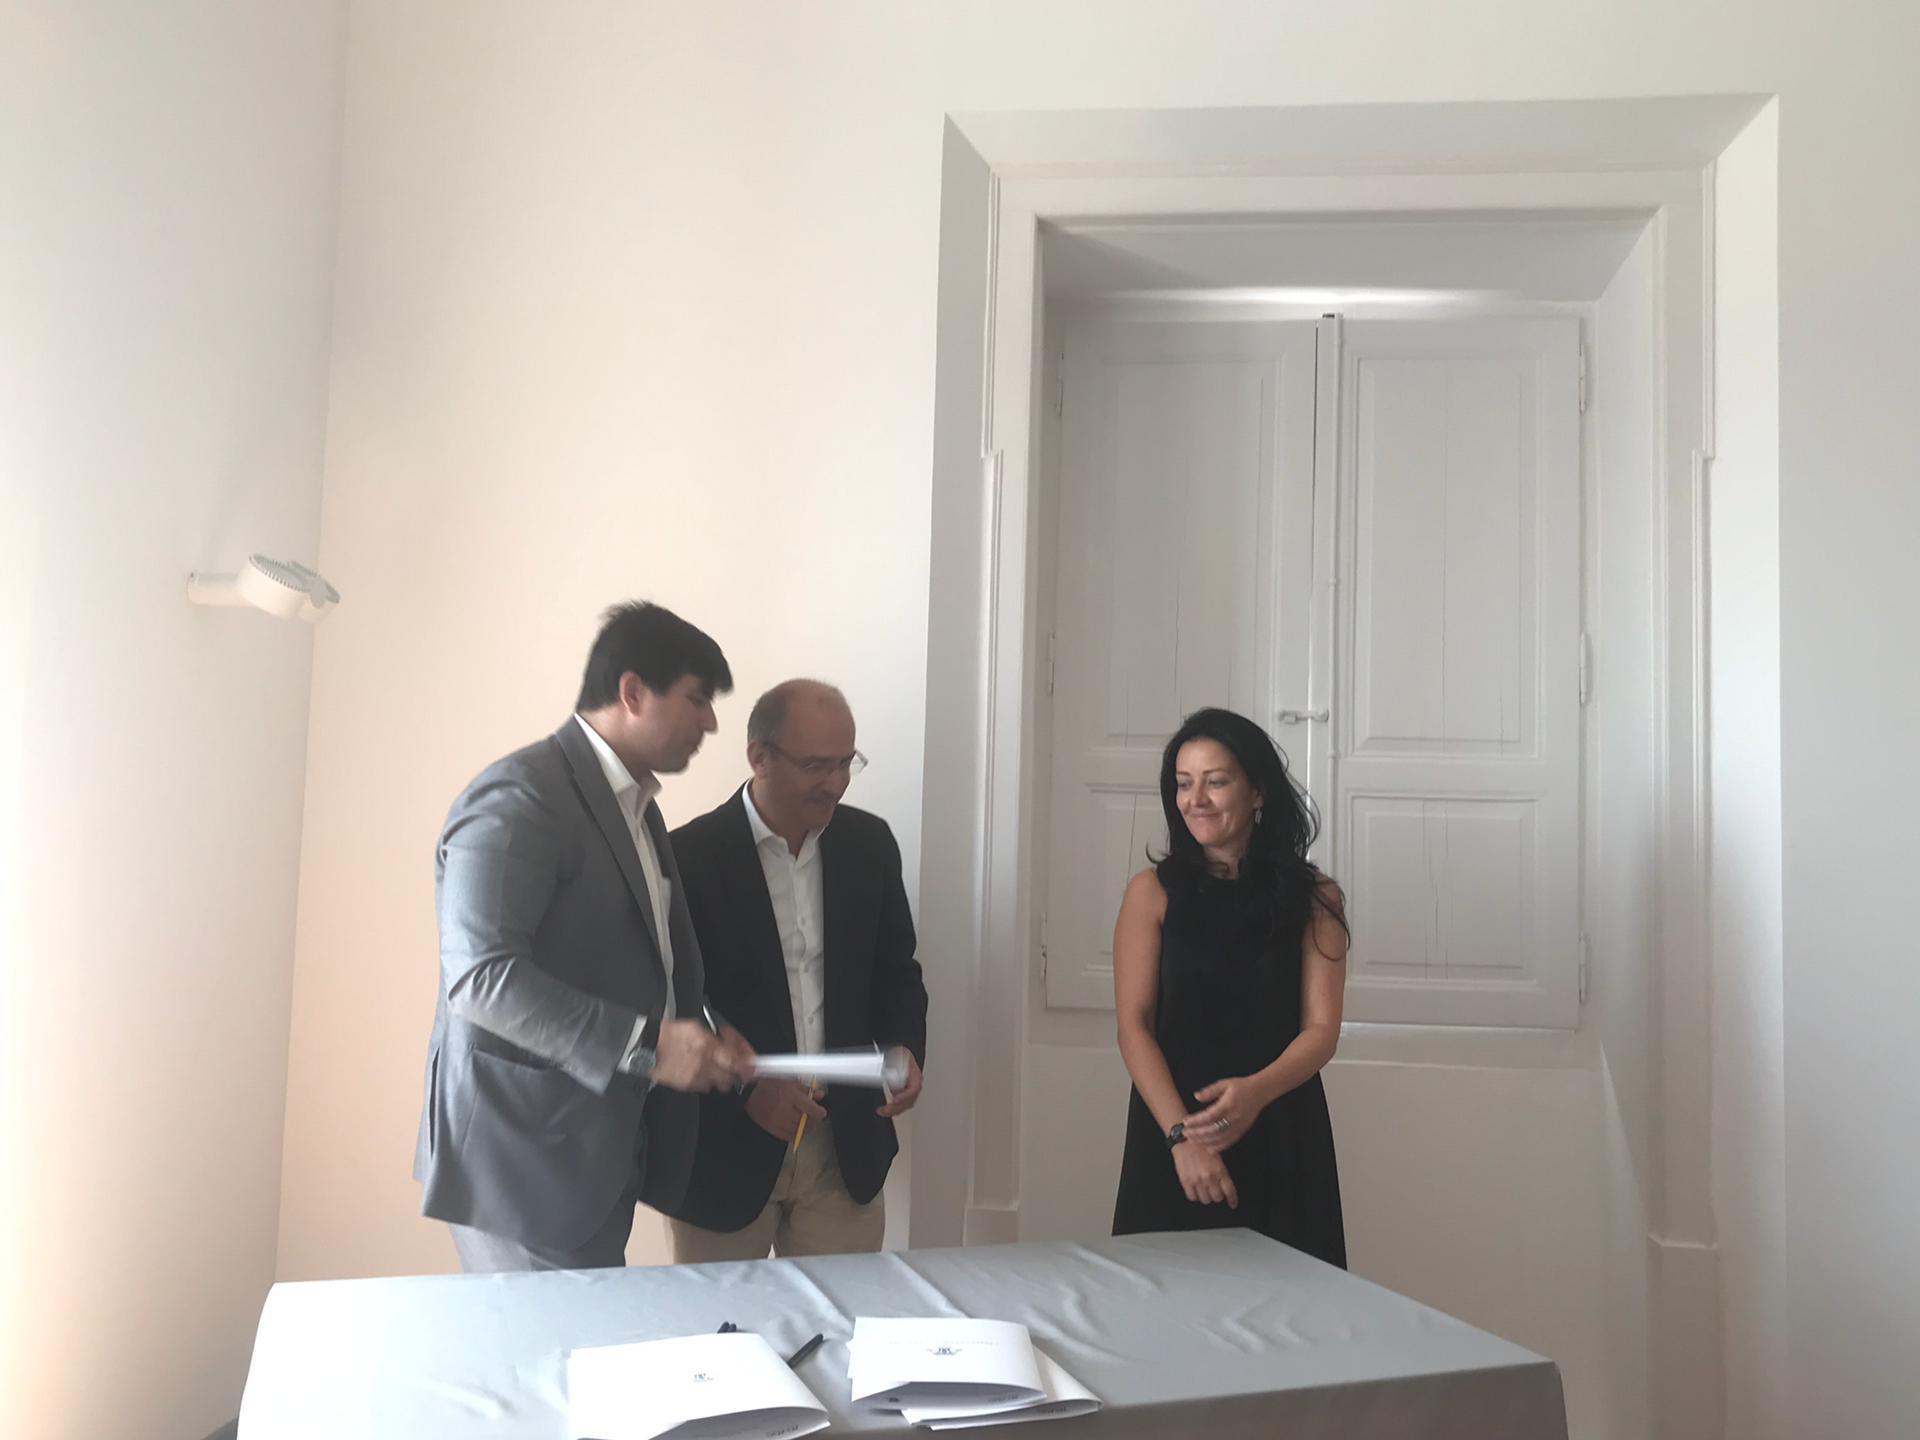 assinatura do projeto literacia